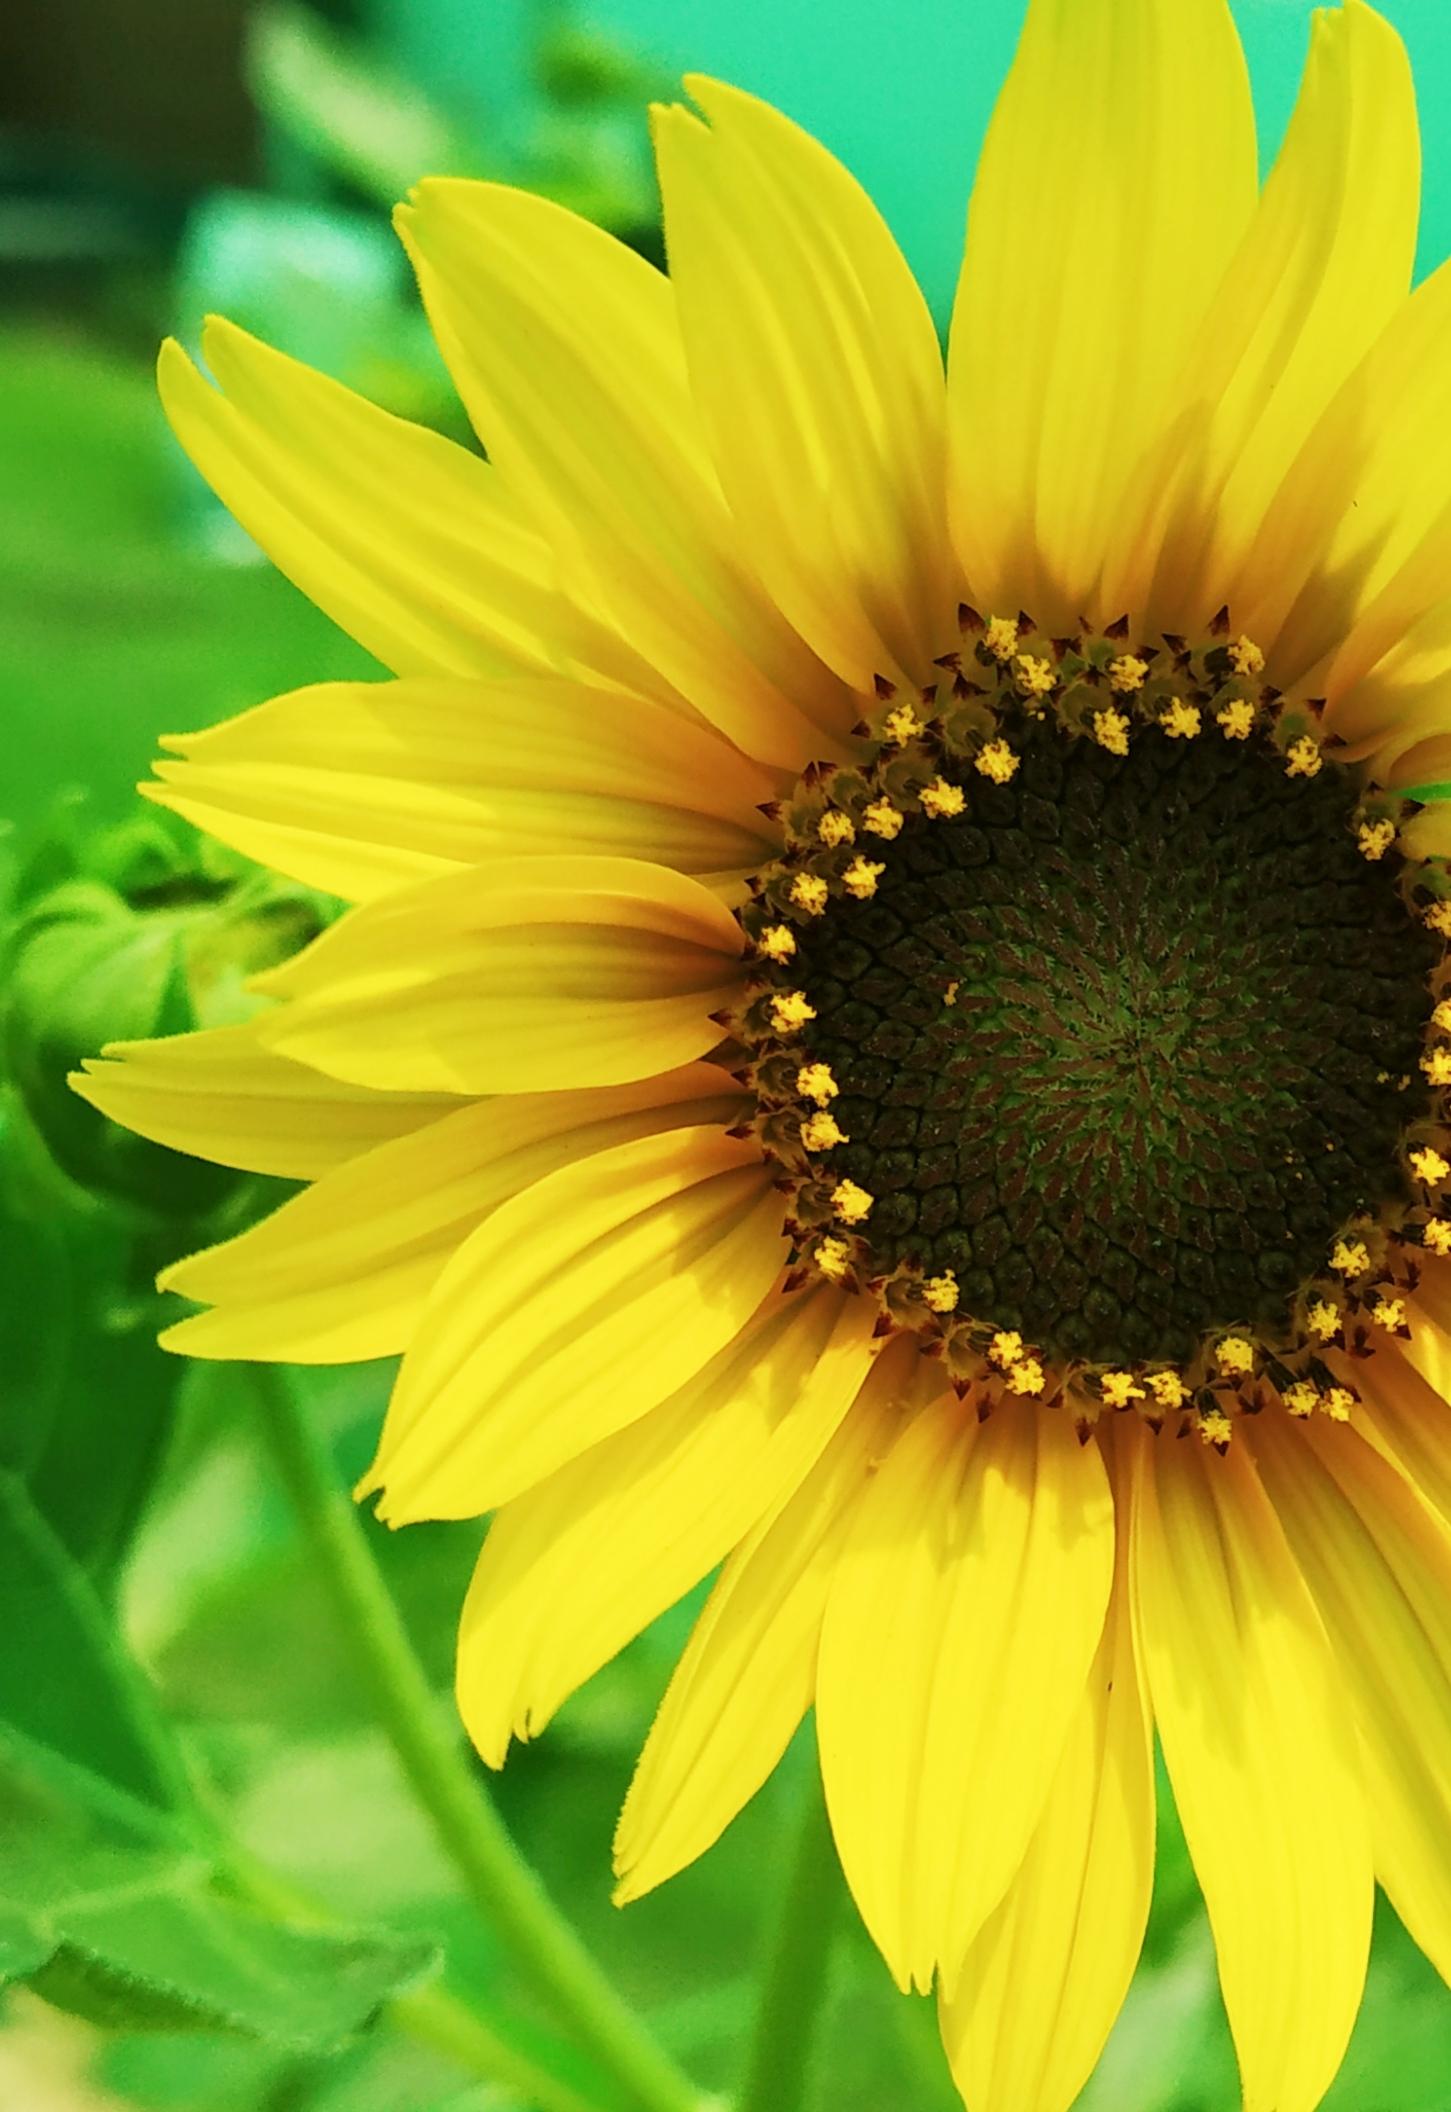 Close-up of a sunflower